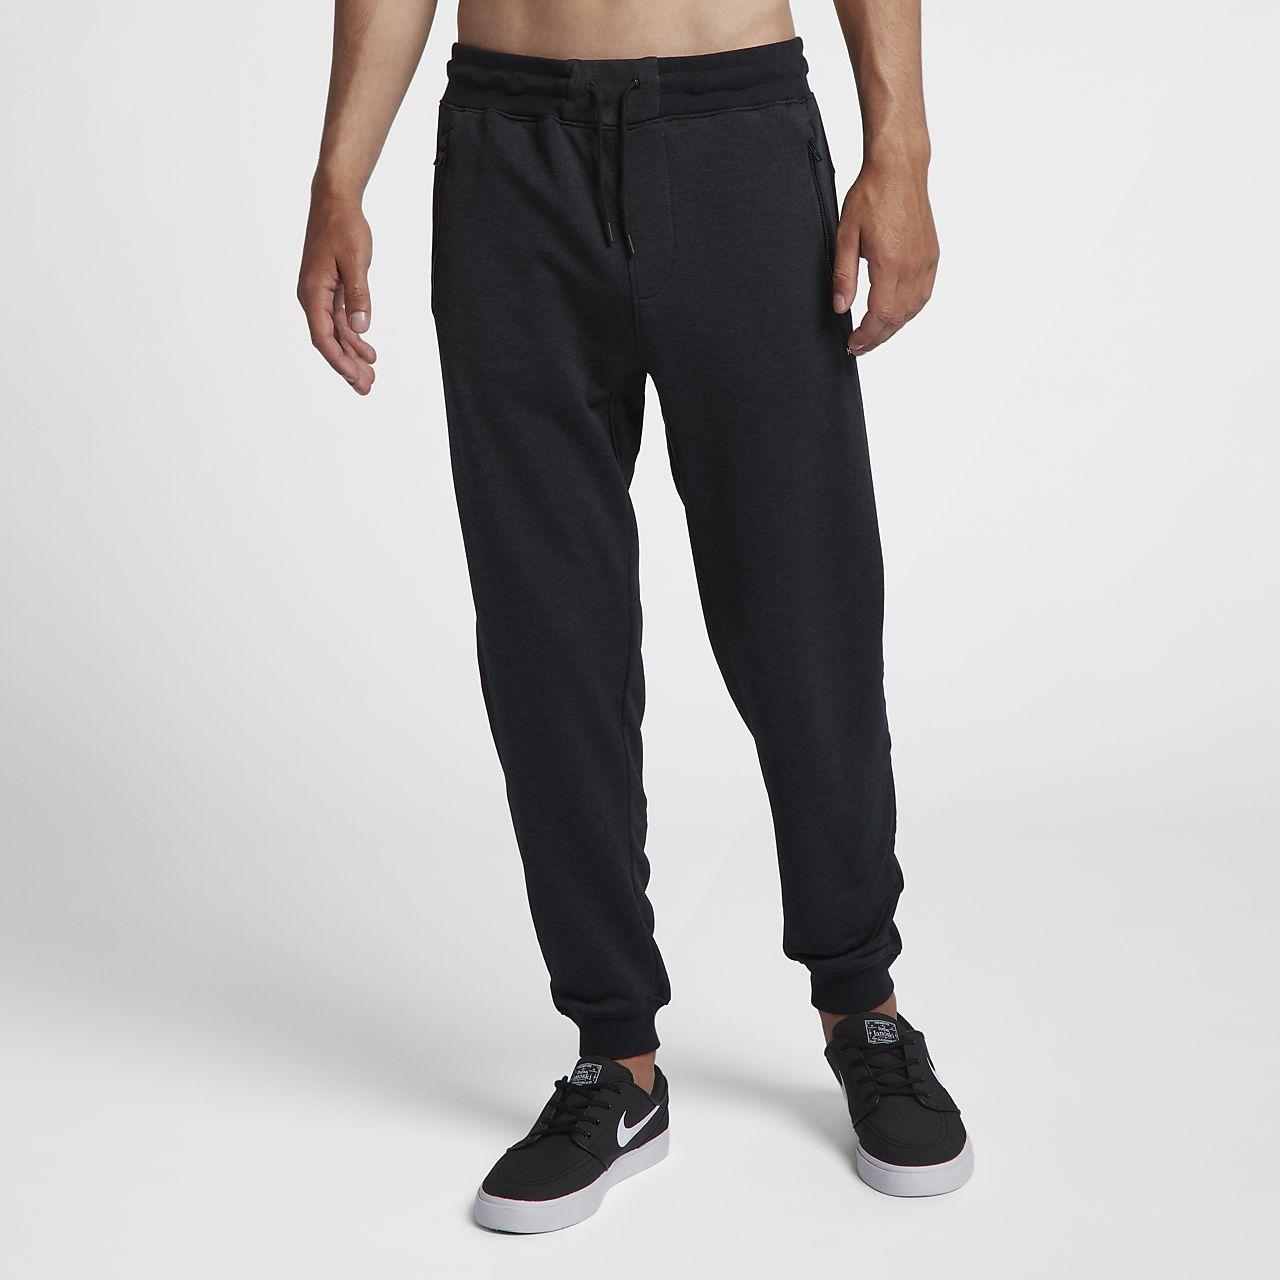 Hurley Dri-FIT Disperse Men's Trousers